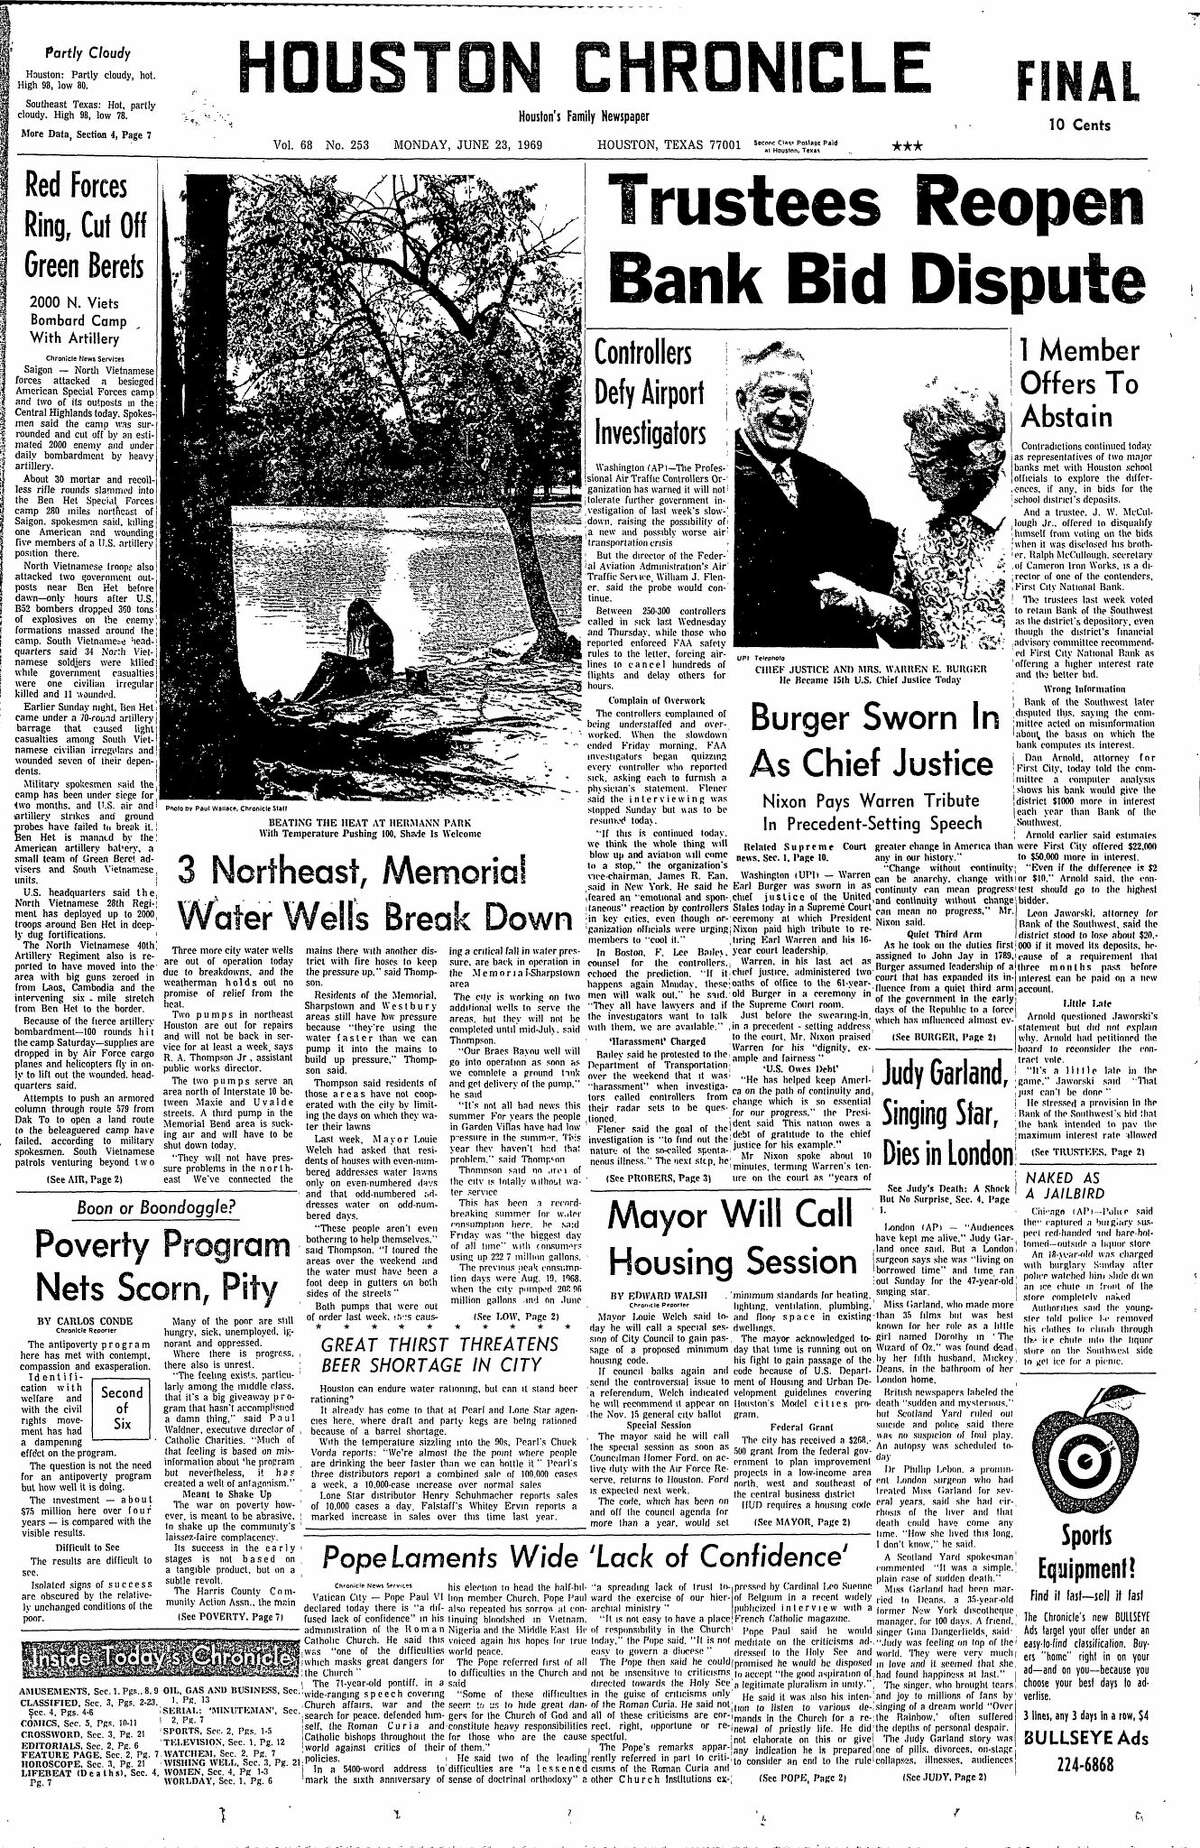 June 23, 1969